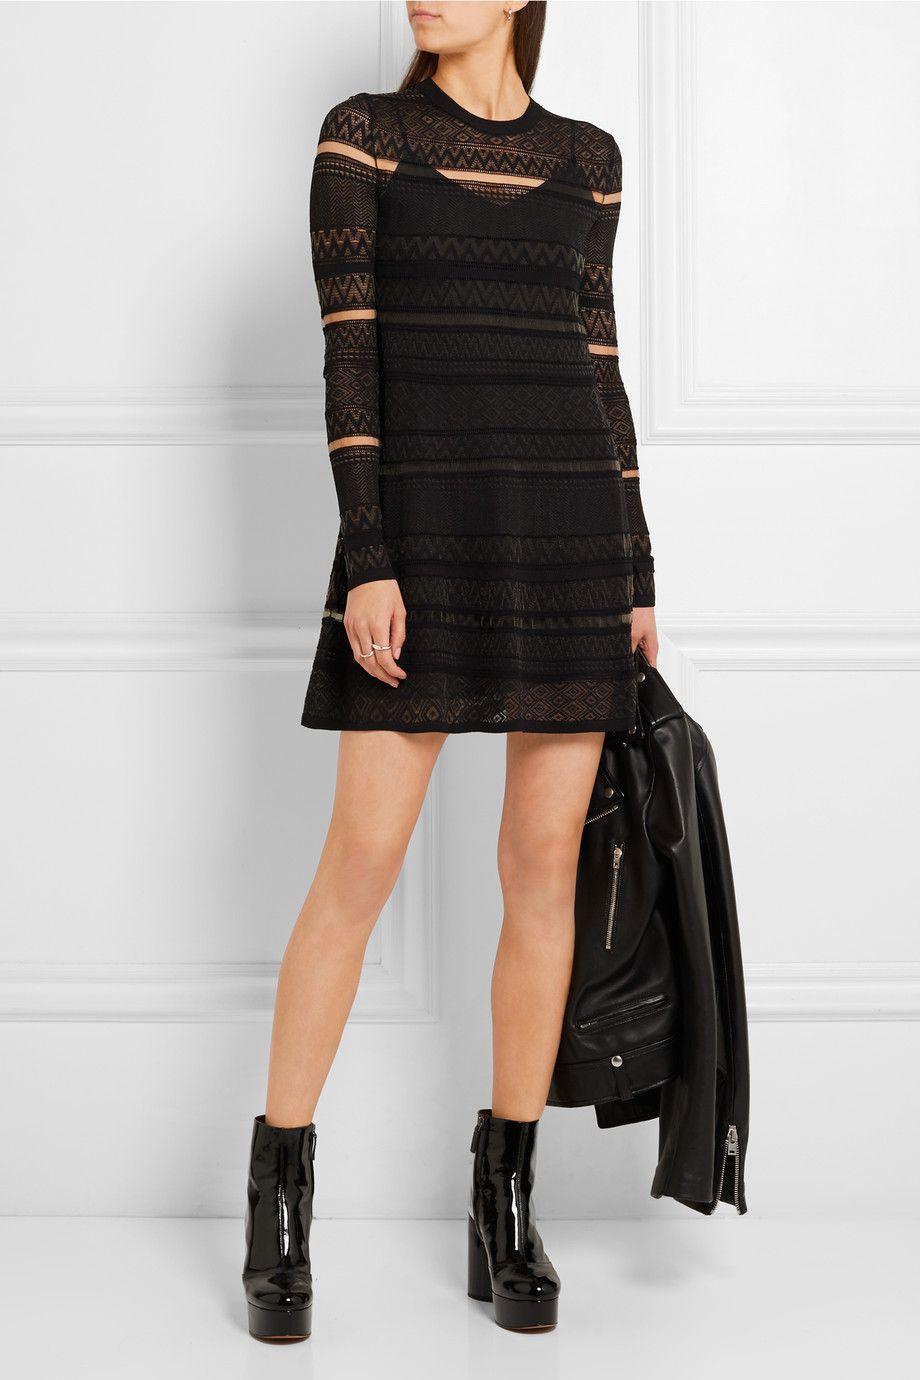 1ff498161ecd6 McQ Alexander McQueen - Knitted mini dress | dresses | Dresses, Mcq ...